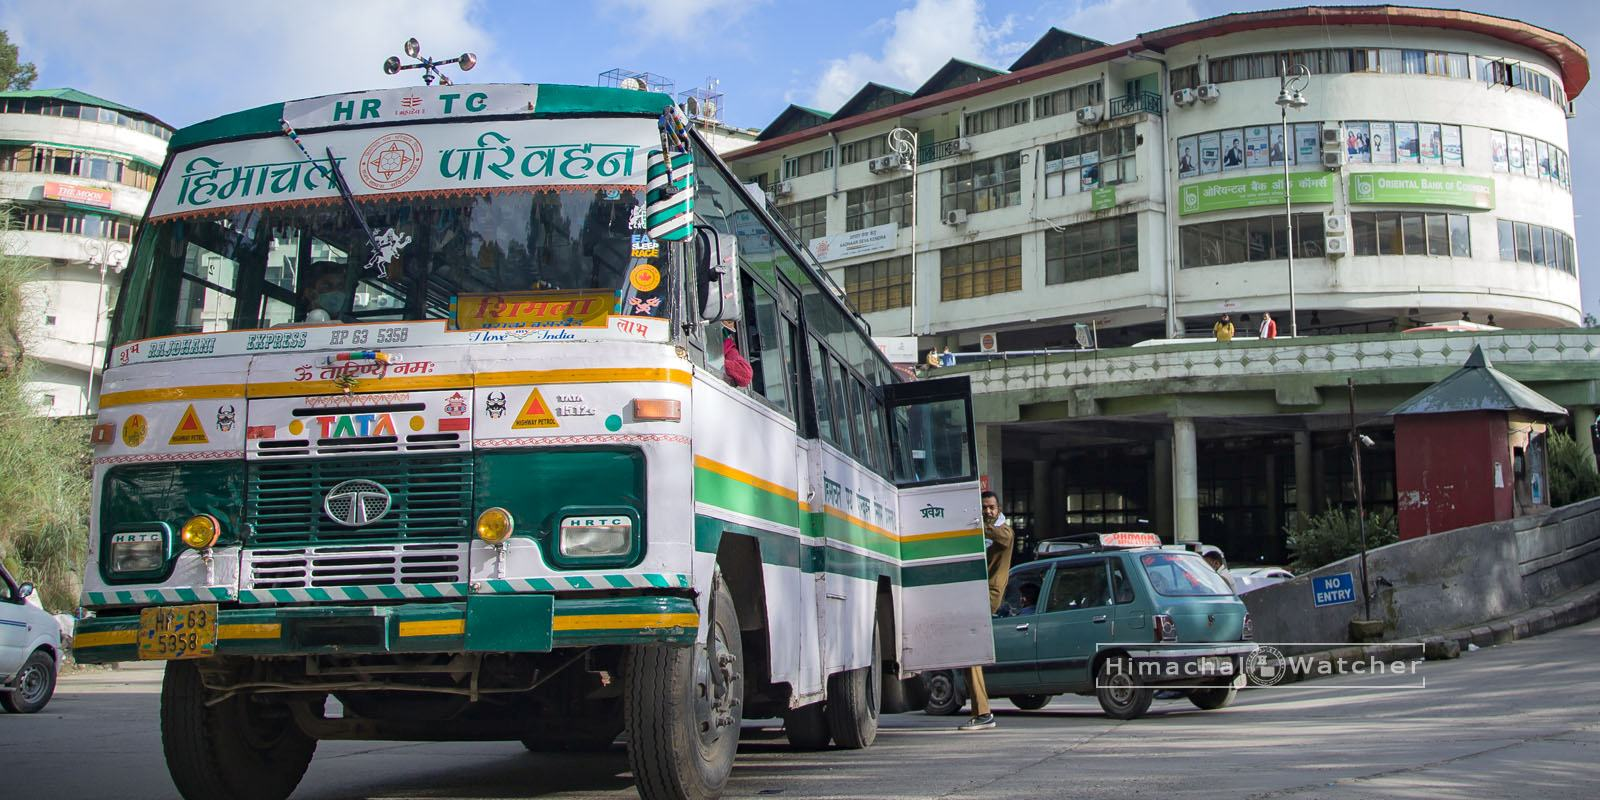 Himachal Pradesh night bus service